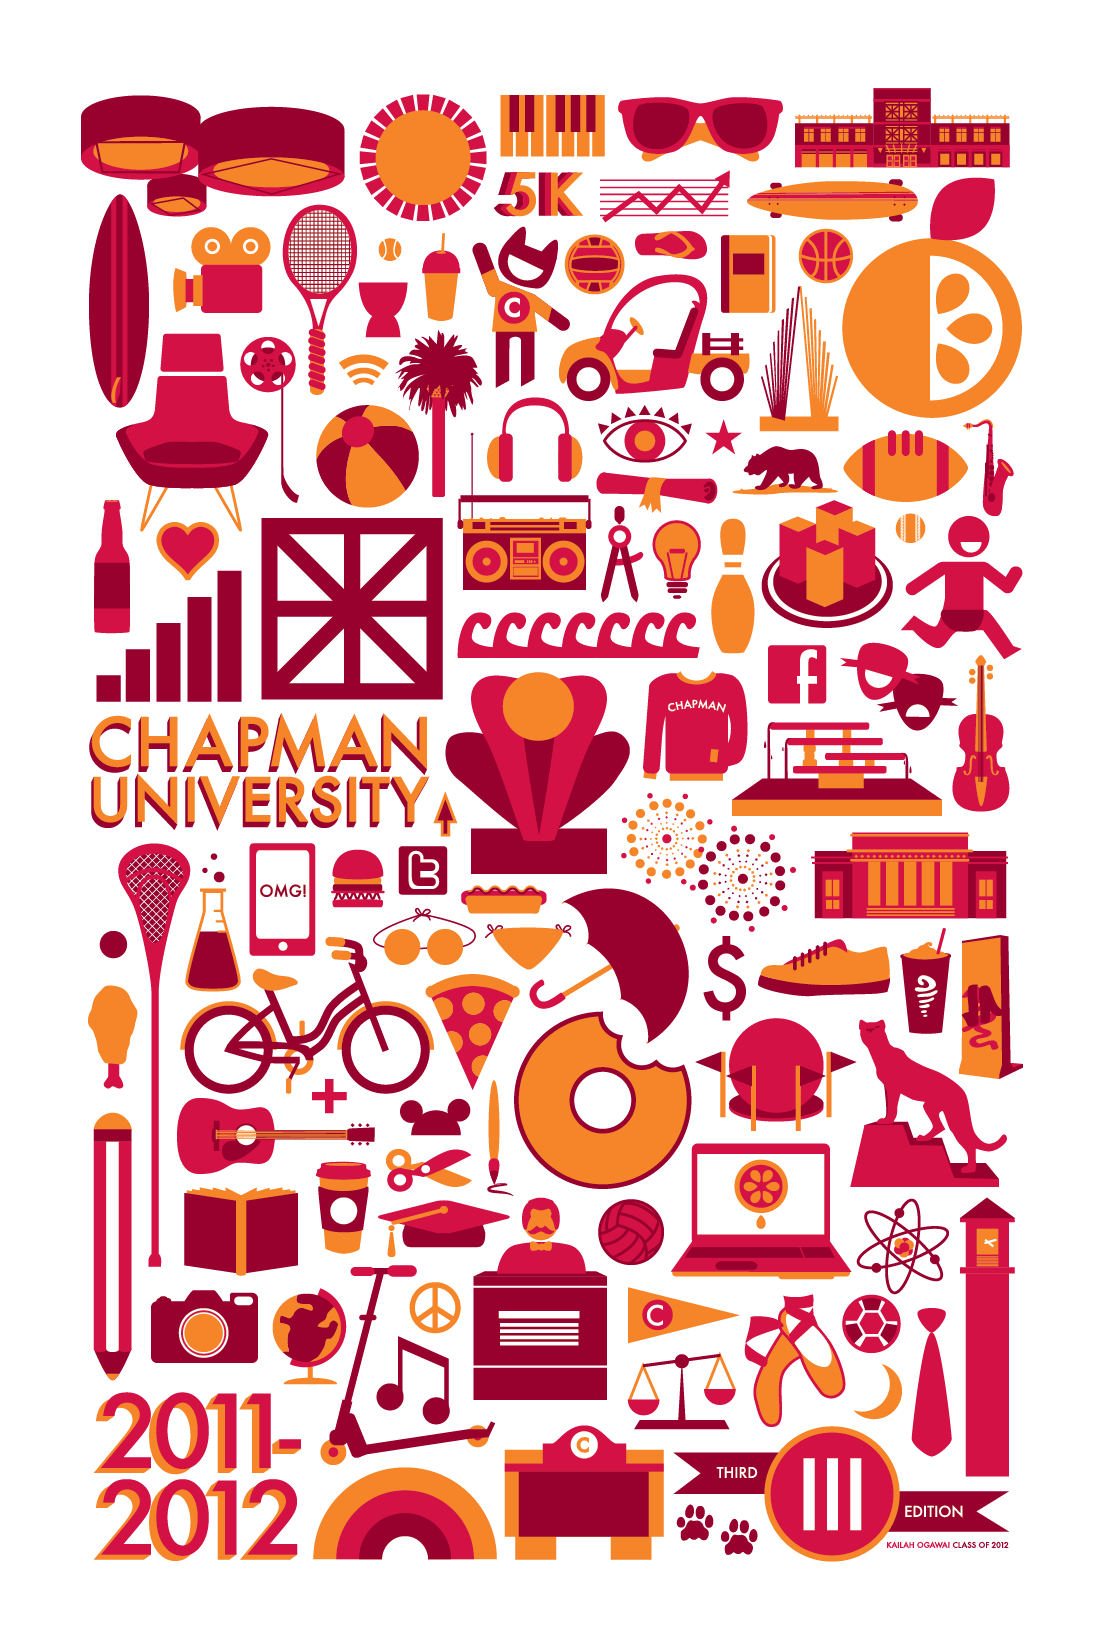 Chapman University Graphic Design Portfolio: Chapman University Poster Third Edition - Vim 6 Vigor :: Strategic rh:vandvcreative.com,Design